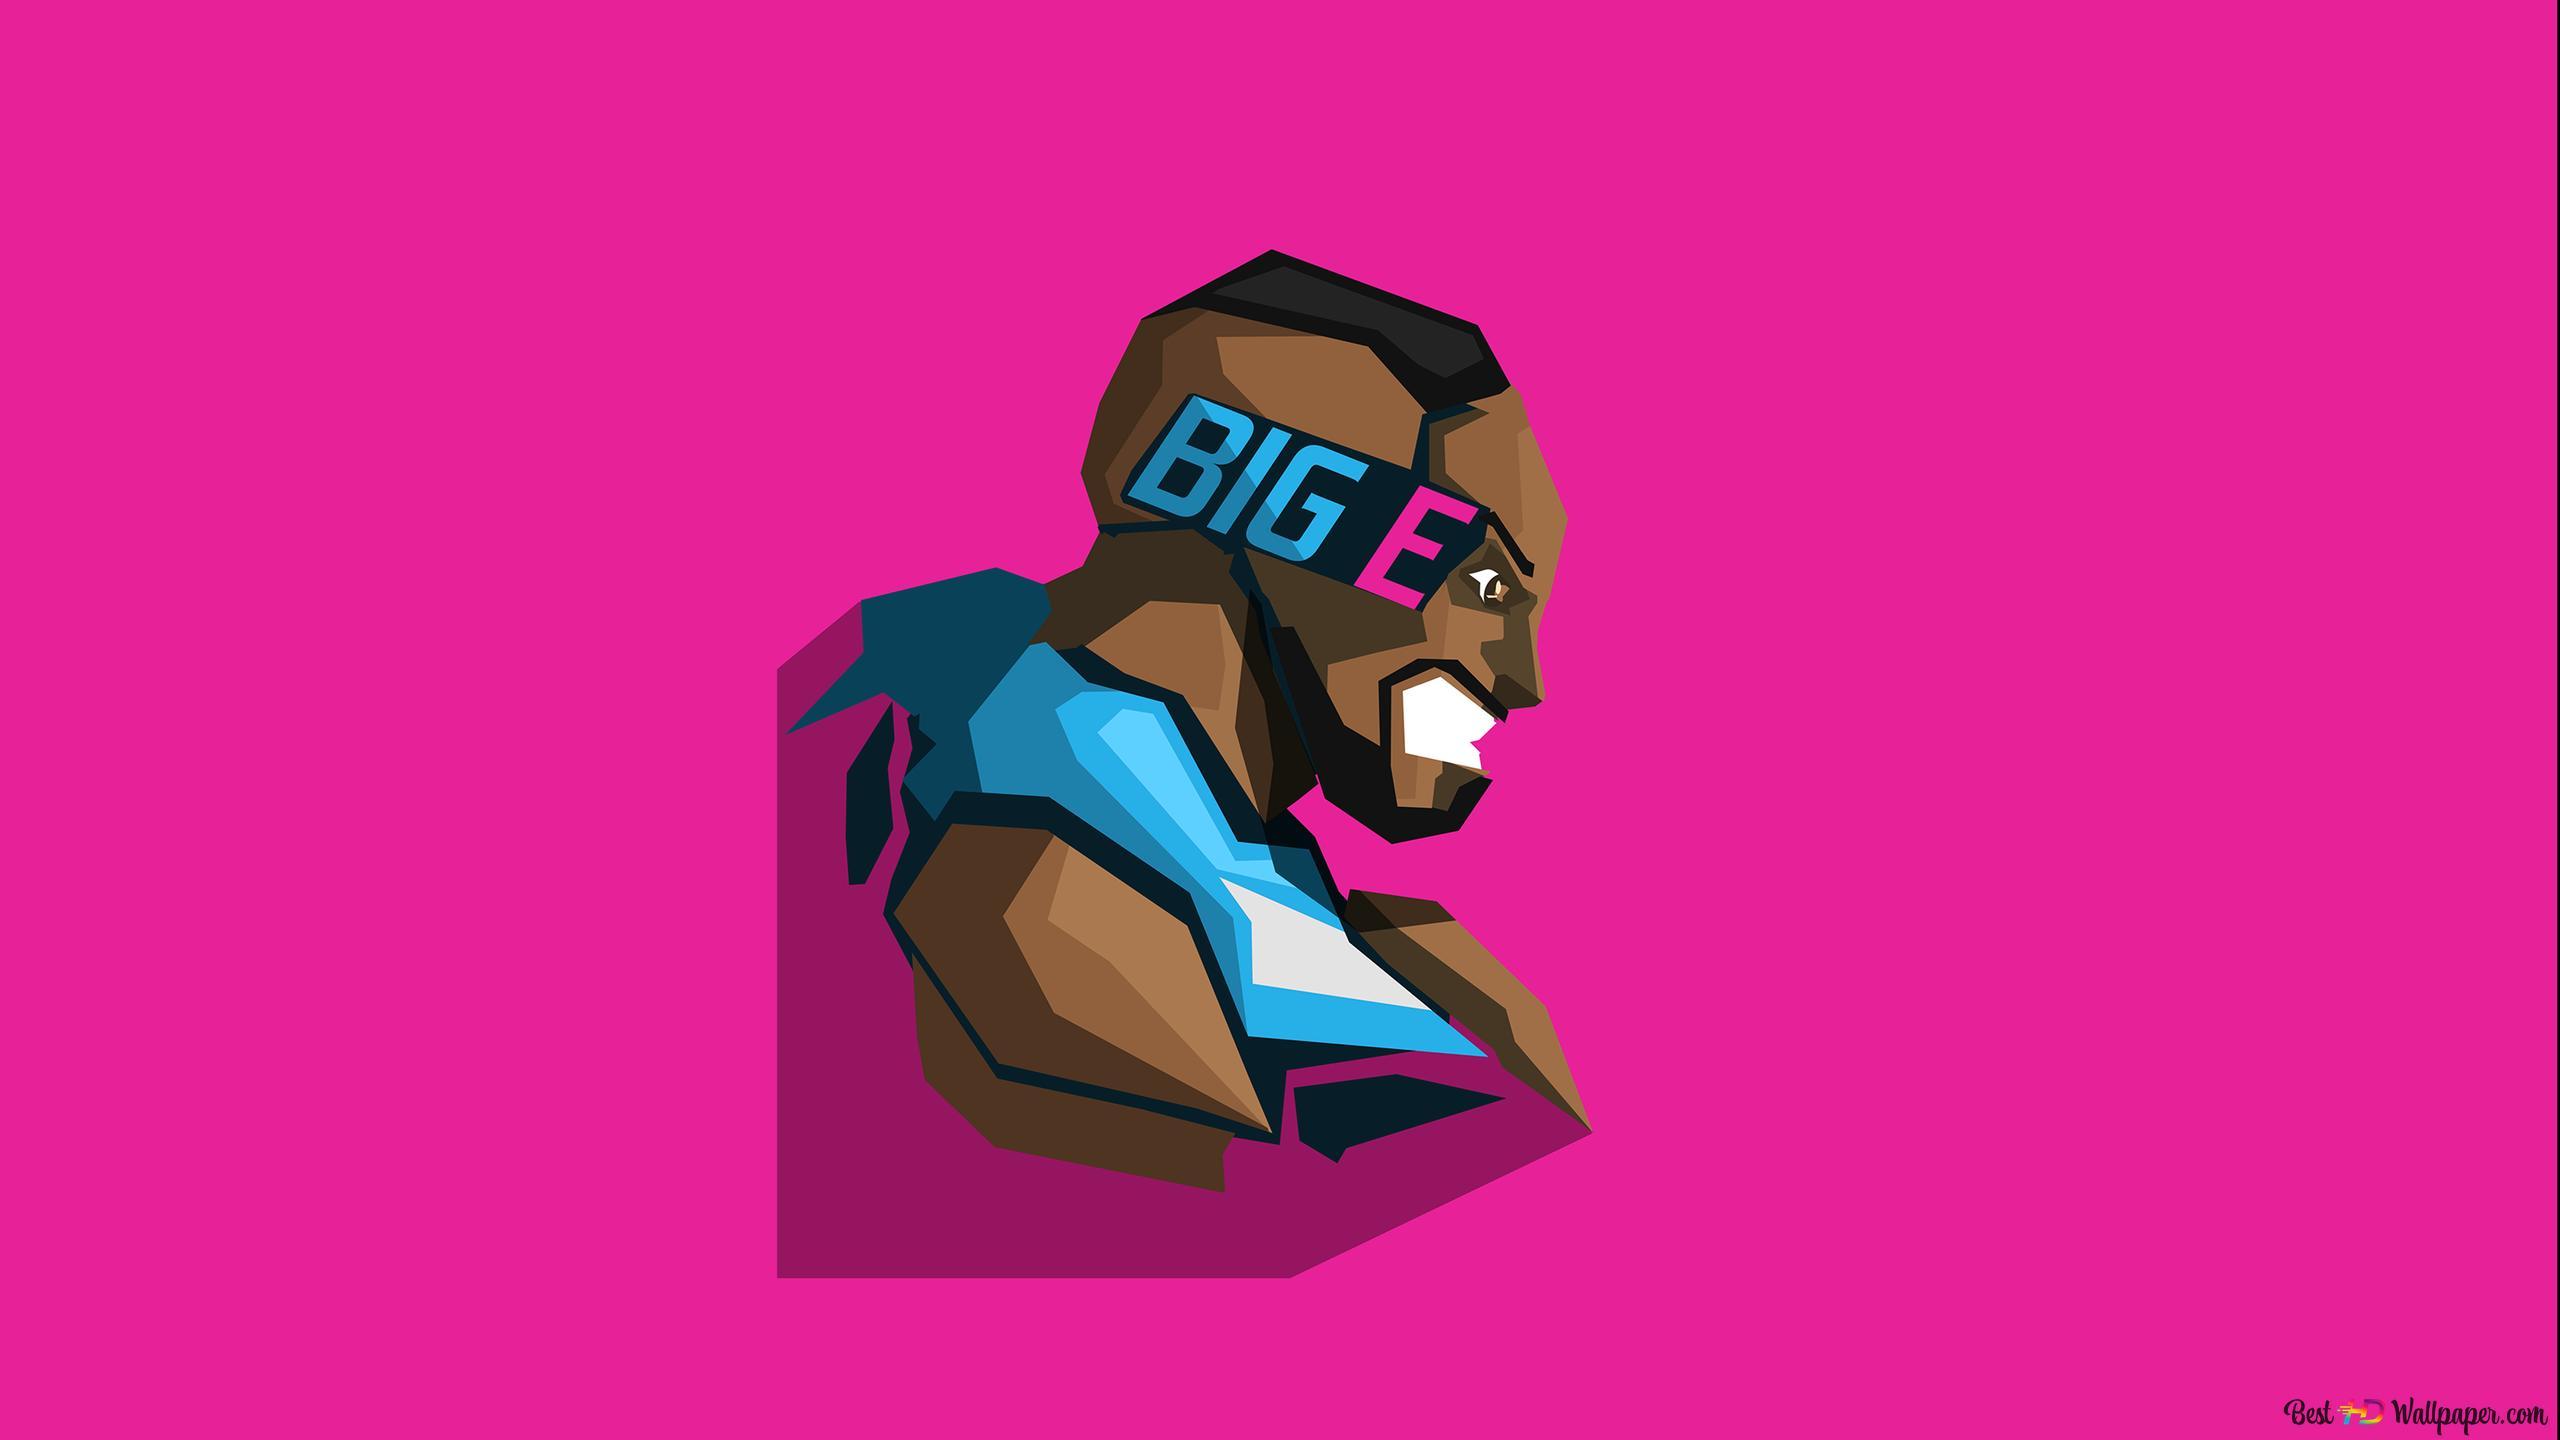 Wrestling Sports Big E Minimalist In Pink Wallpaper Background Hd Wallpaper Download